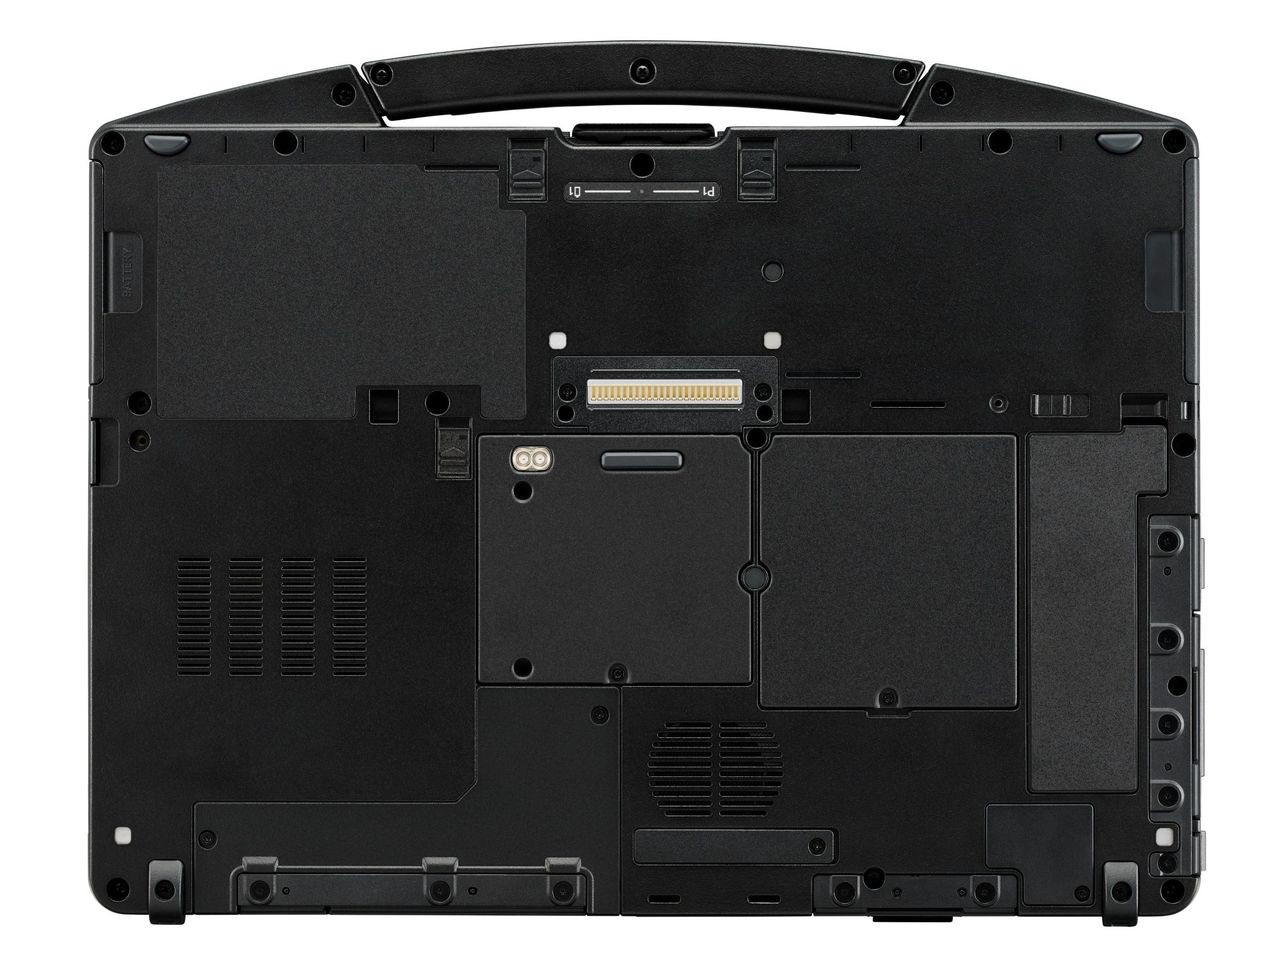 Panasonic Toughbook 55, FZ-55 back